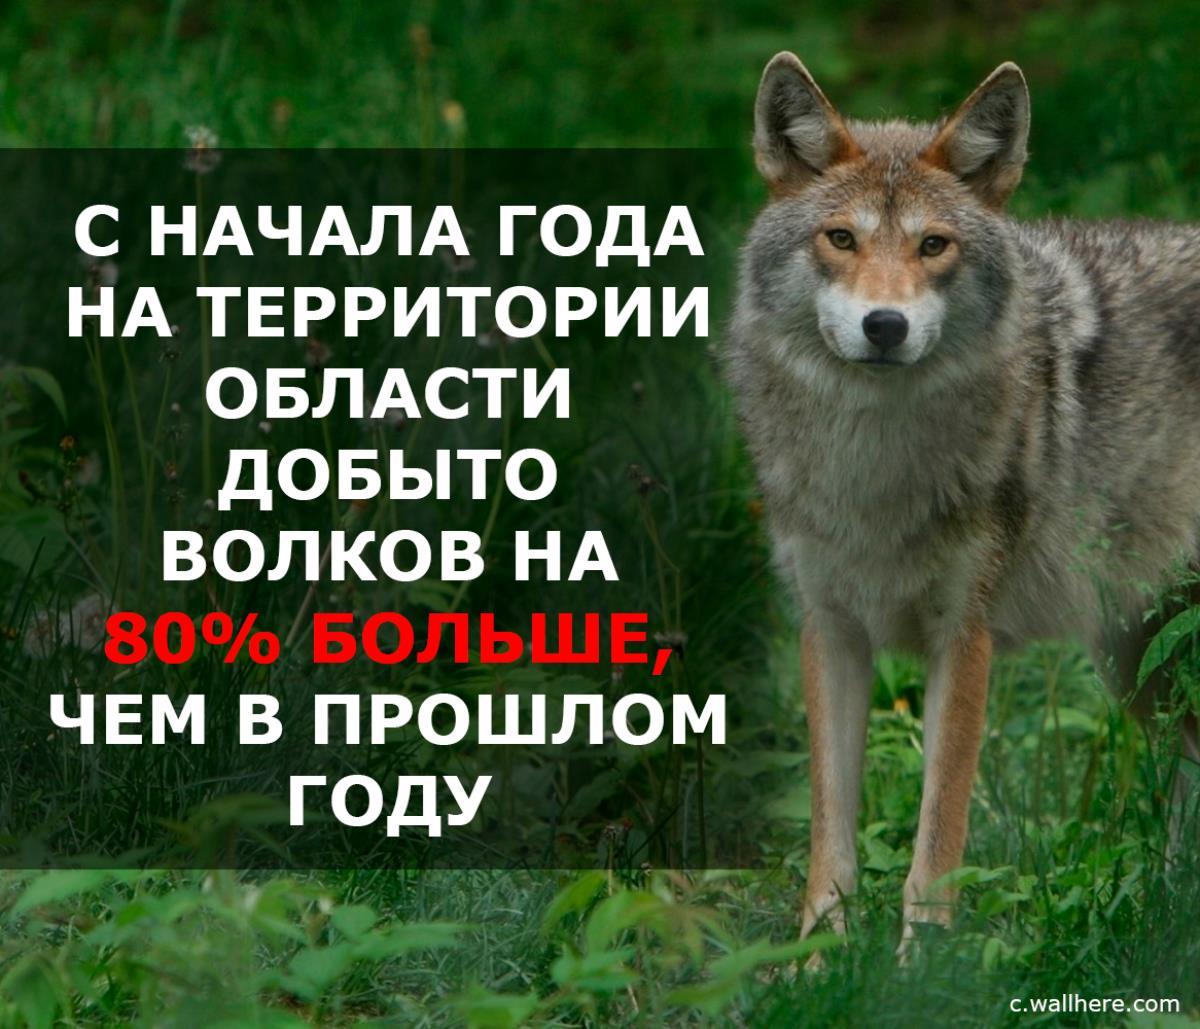 Омутнинские охотники добыли на «вабу» самца волка